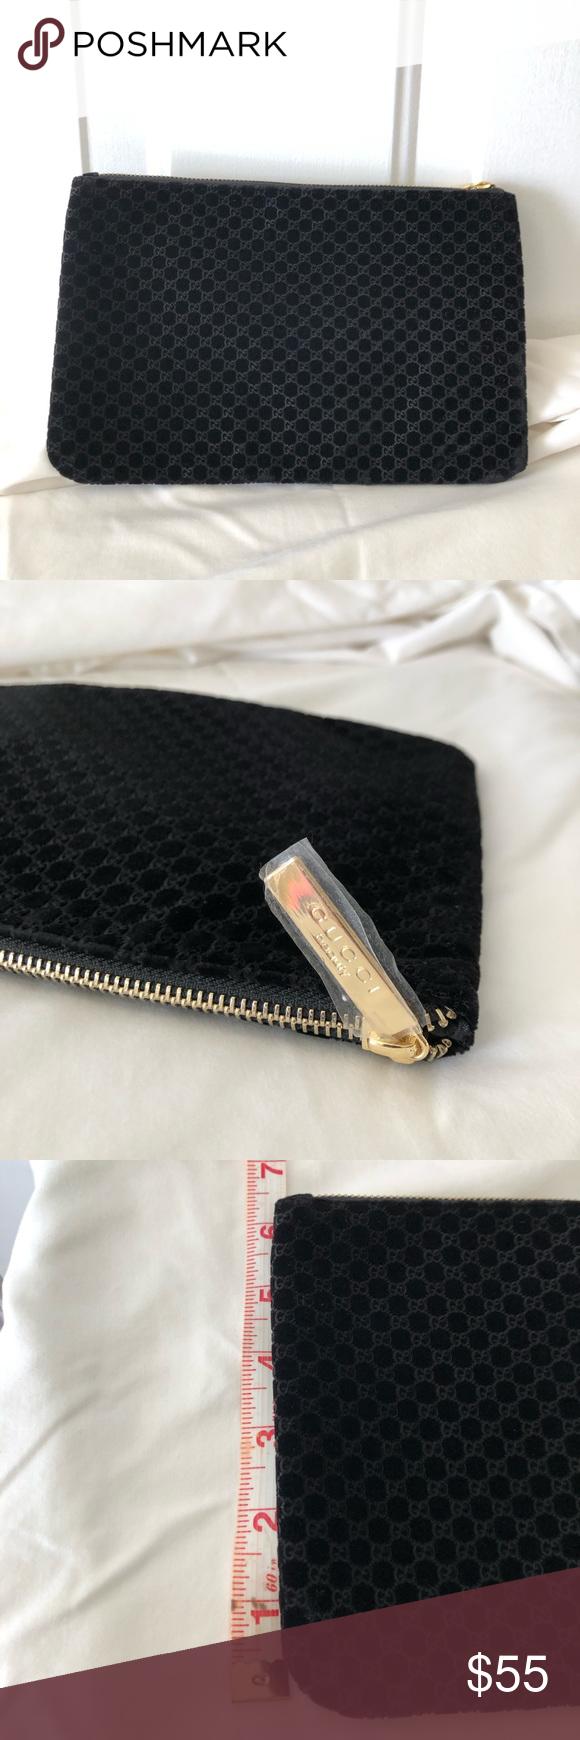 Brand new Gucci beauty black velvet make up bag Makeup